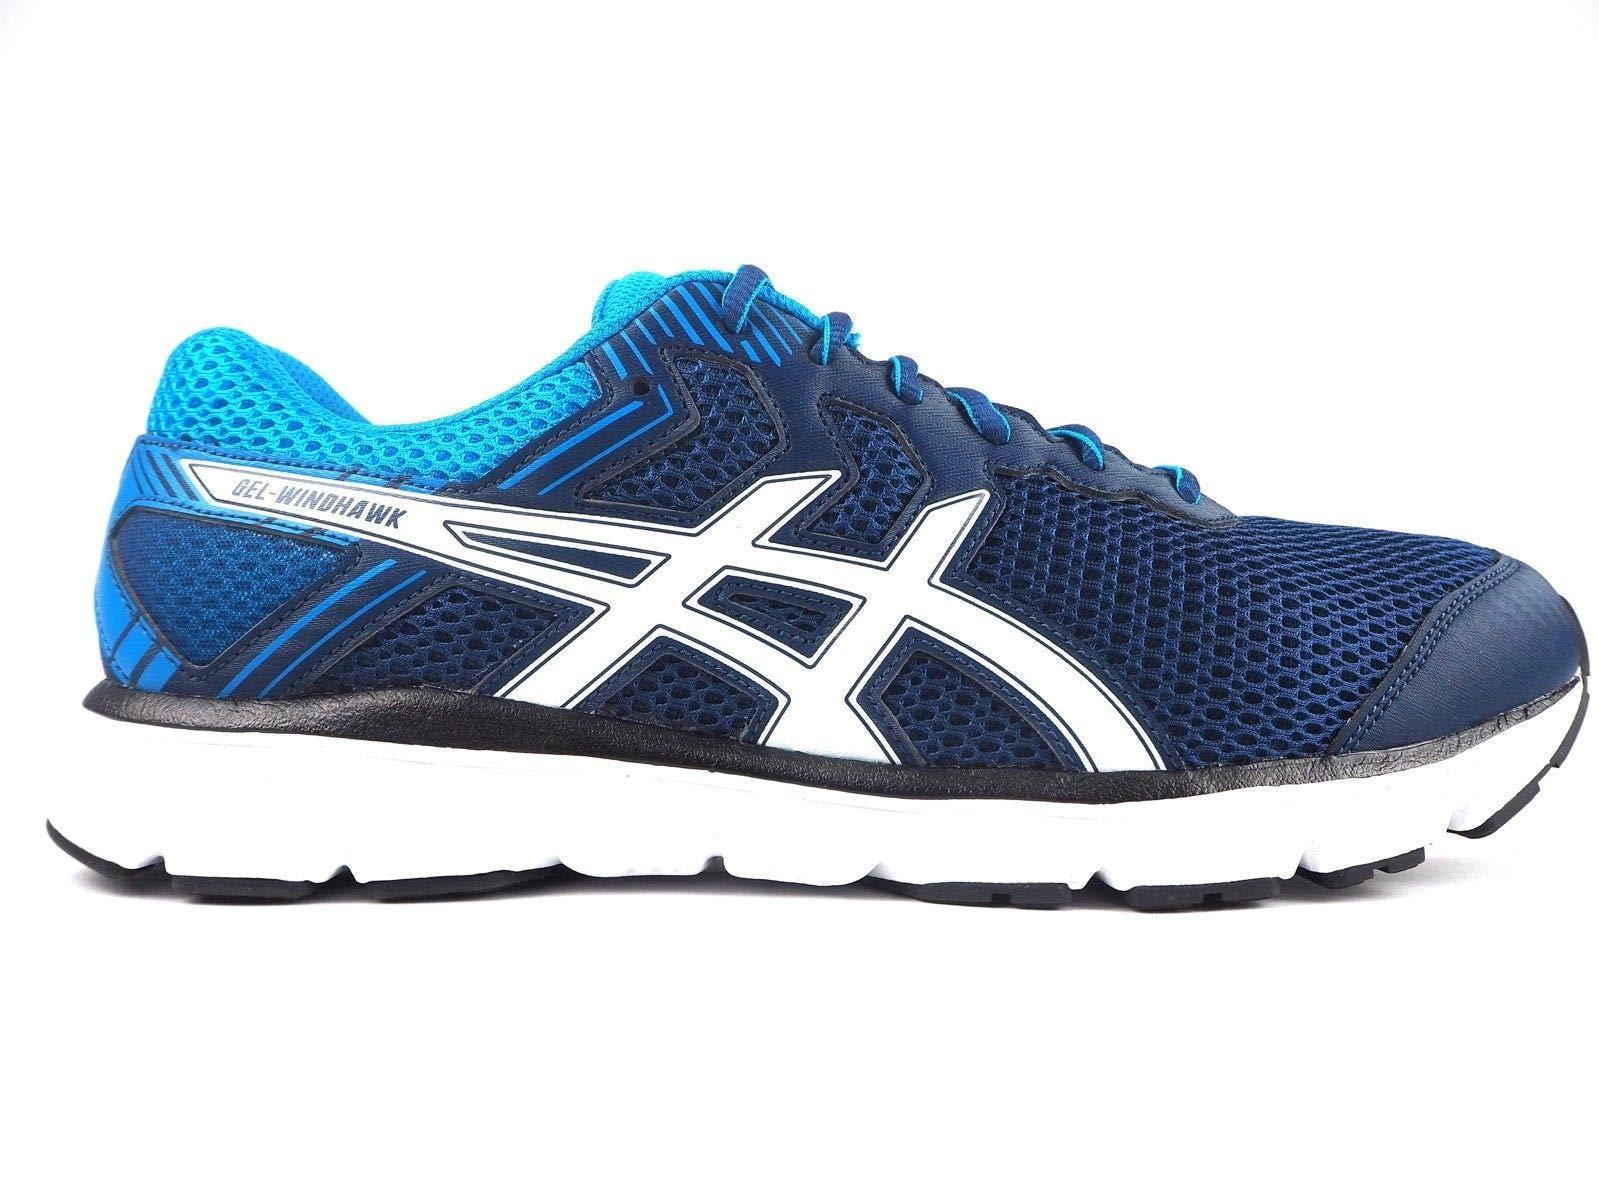 ASICS GEL-WINDHAWK Men's Running Shoes